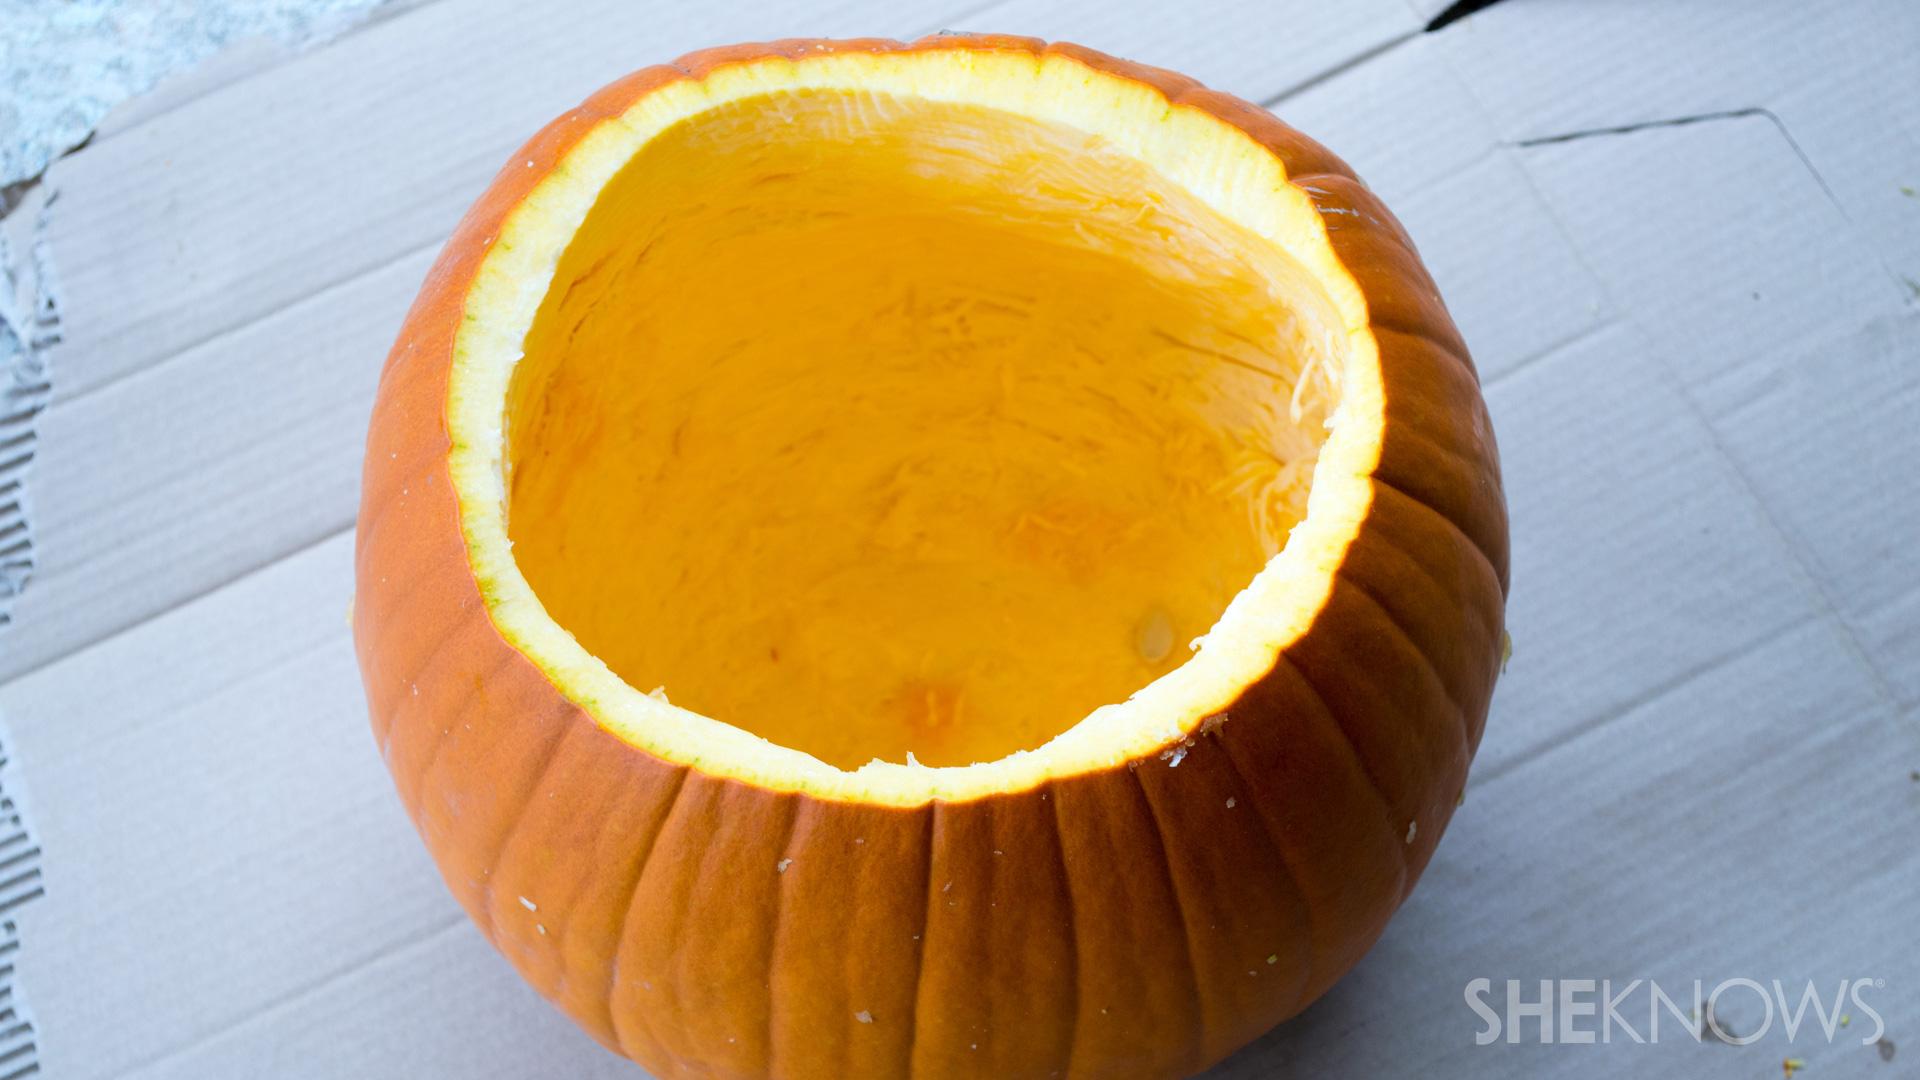 DIY Pumpkin planter: Make hole bigger